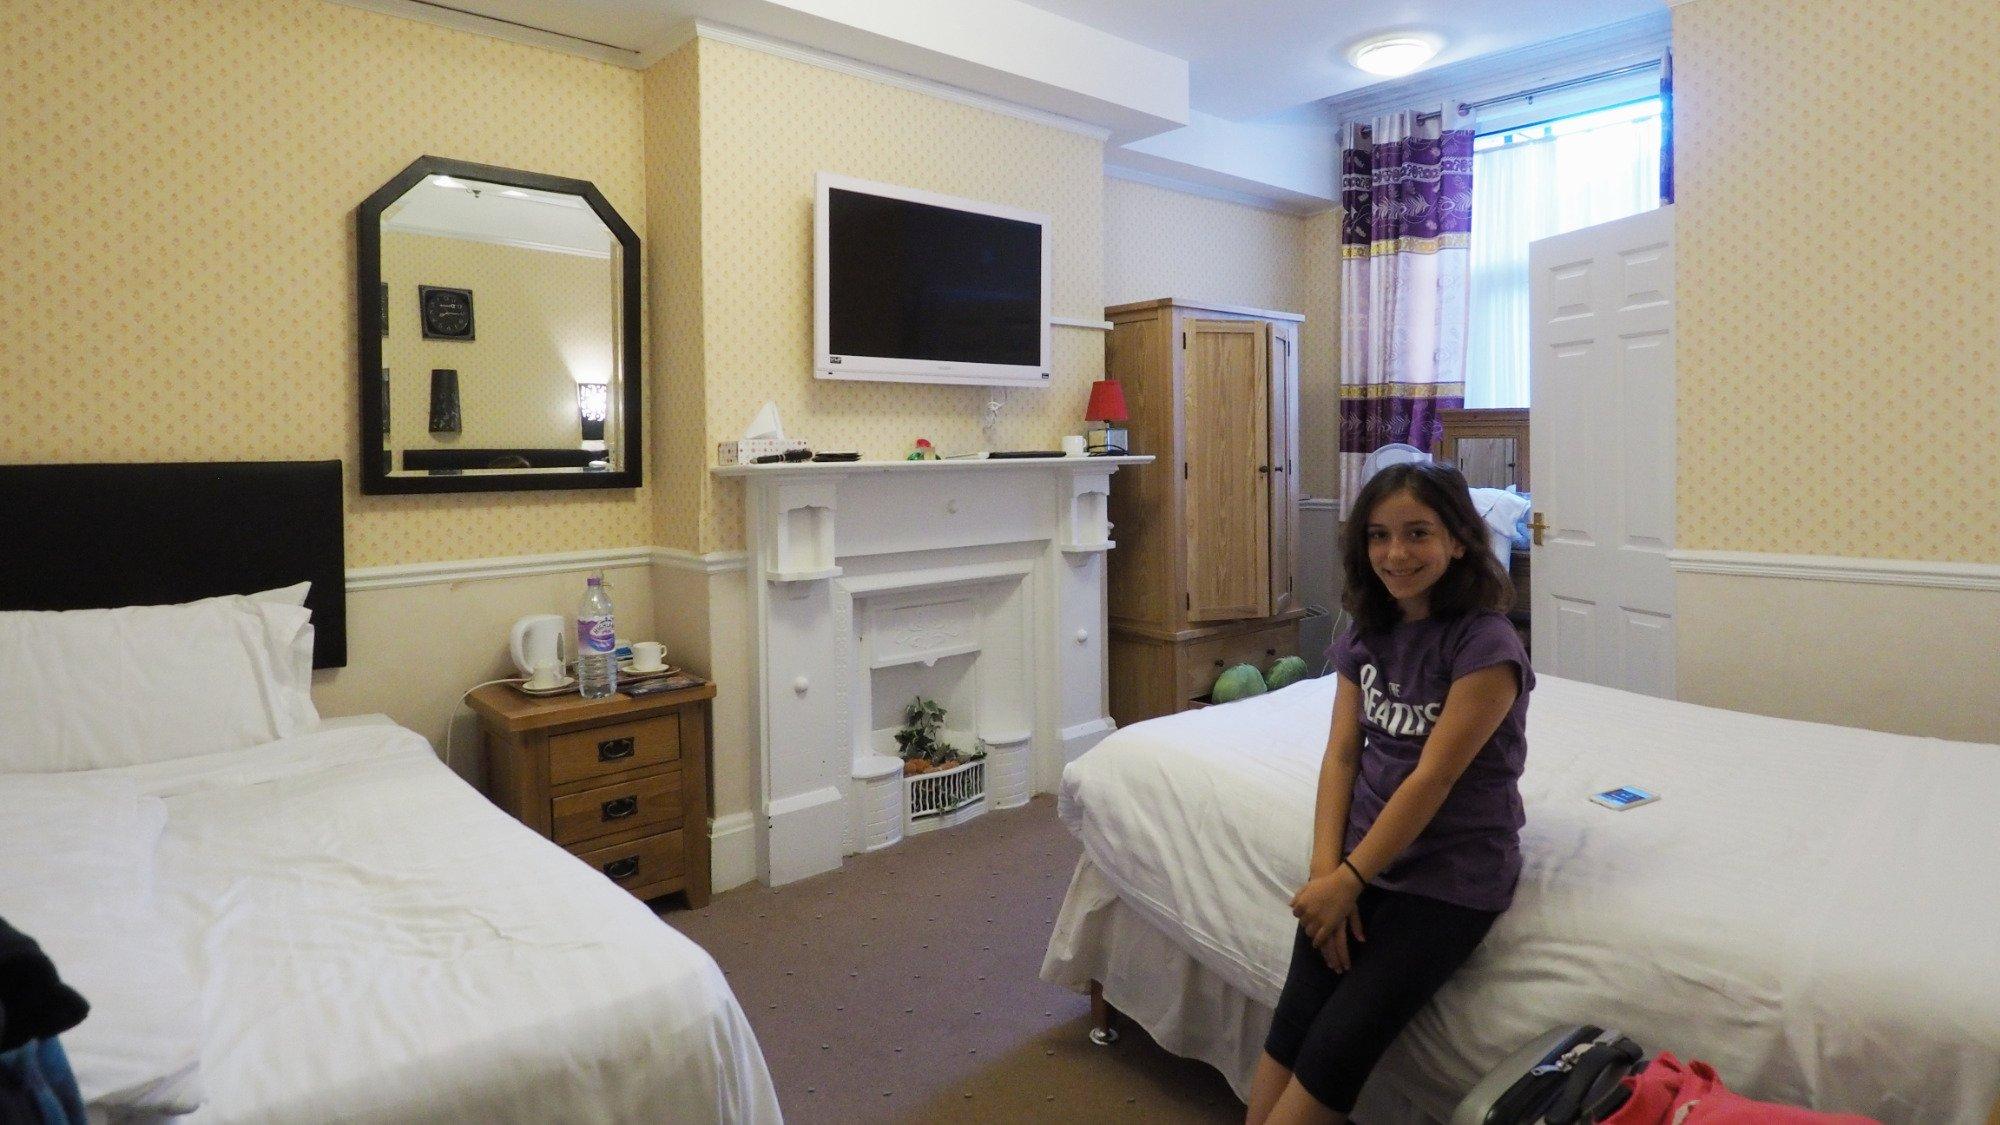 Diamonds Guest House (York) - Guesthouse eviews, Photos & Price ... - ^